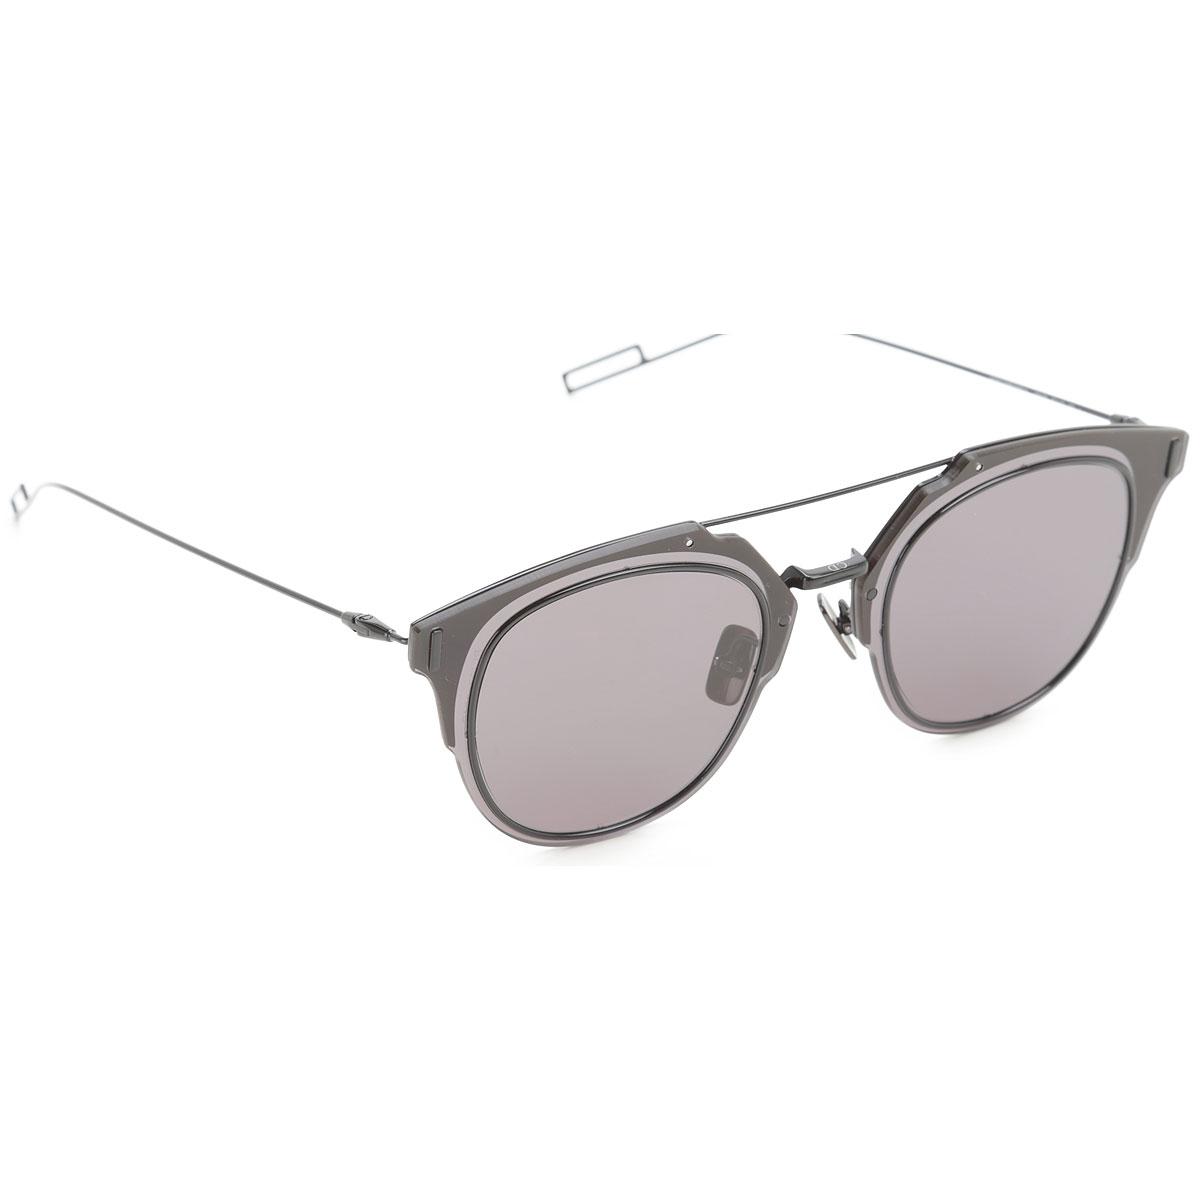 3de79ab9ac Christian Dior Γυαλιά Ηλίου Σε Έκπτωση